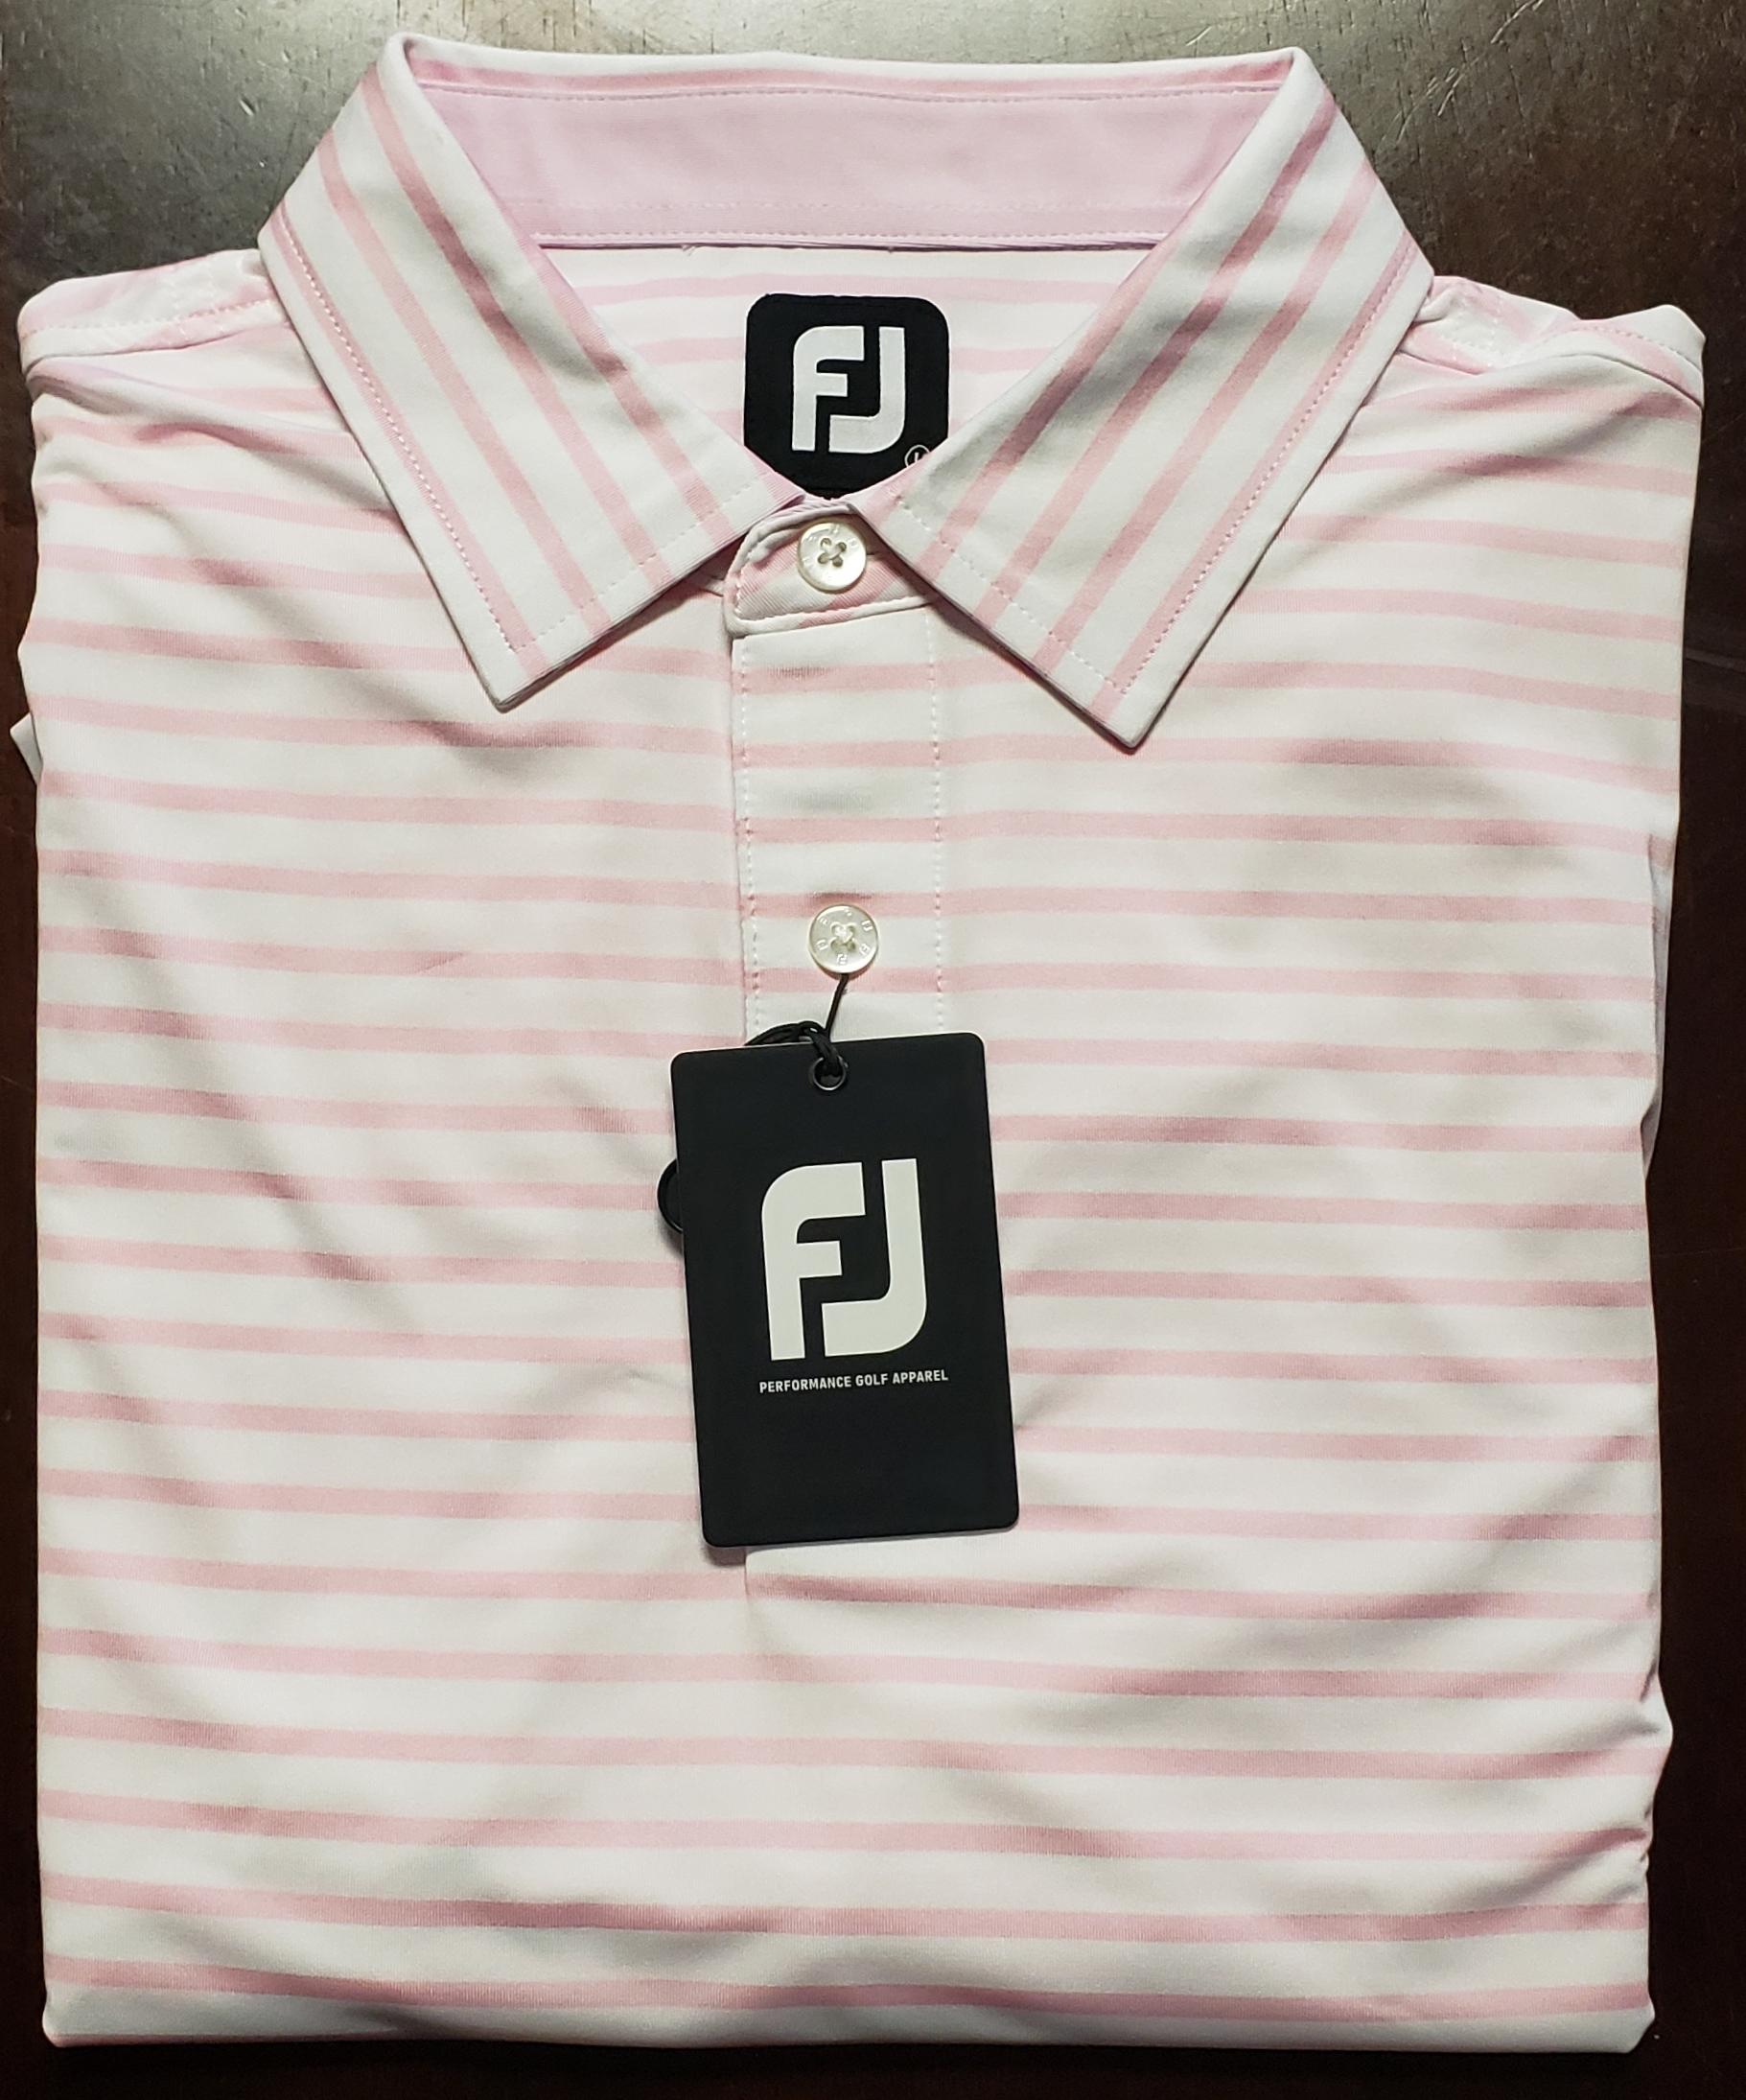 FootJoy Pink/White Stripe Polo: $75